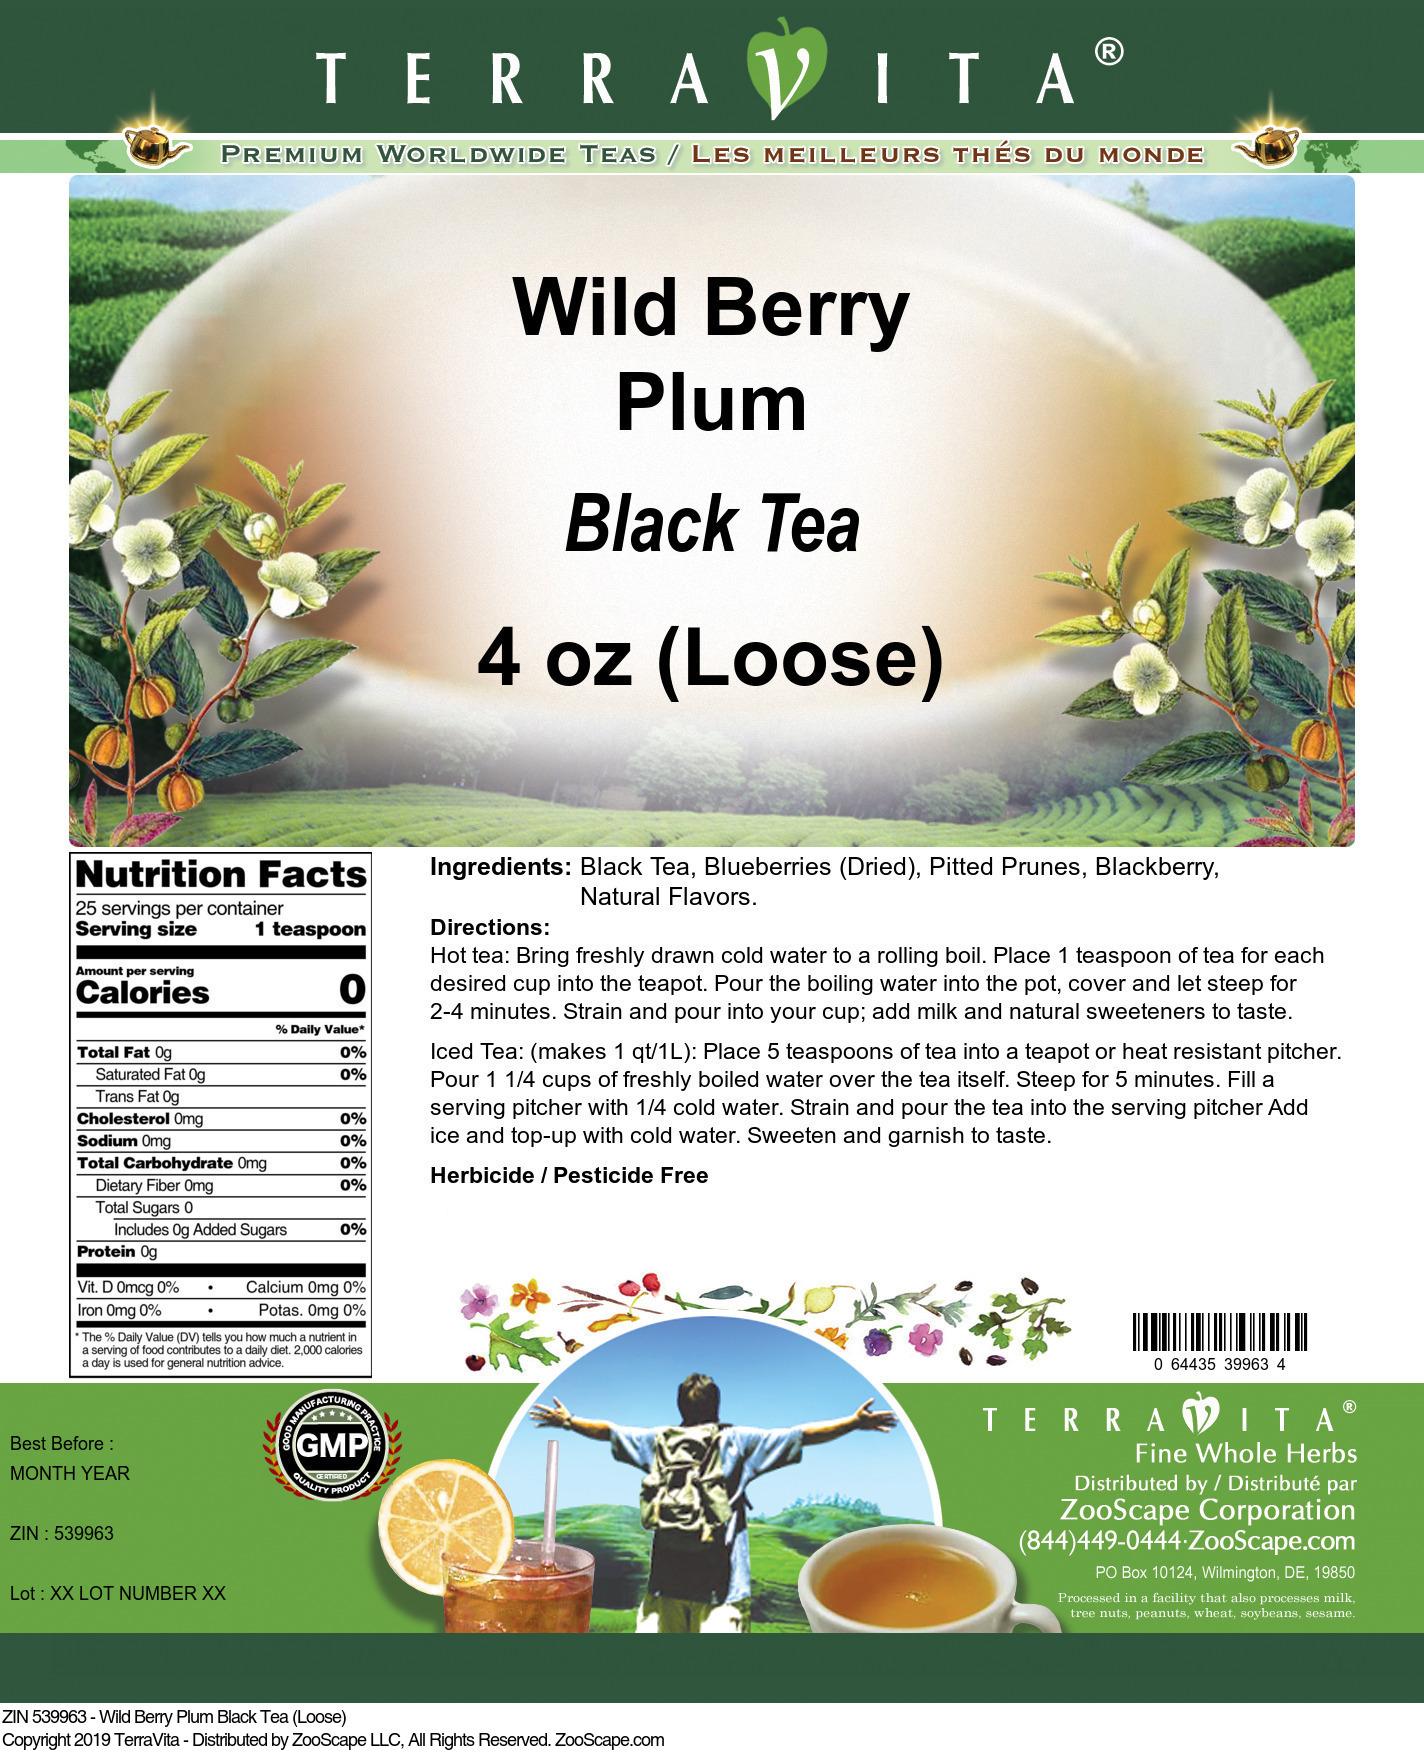 Wild Berry Plum Black Tea